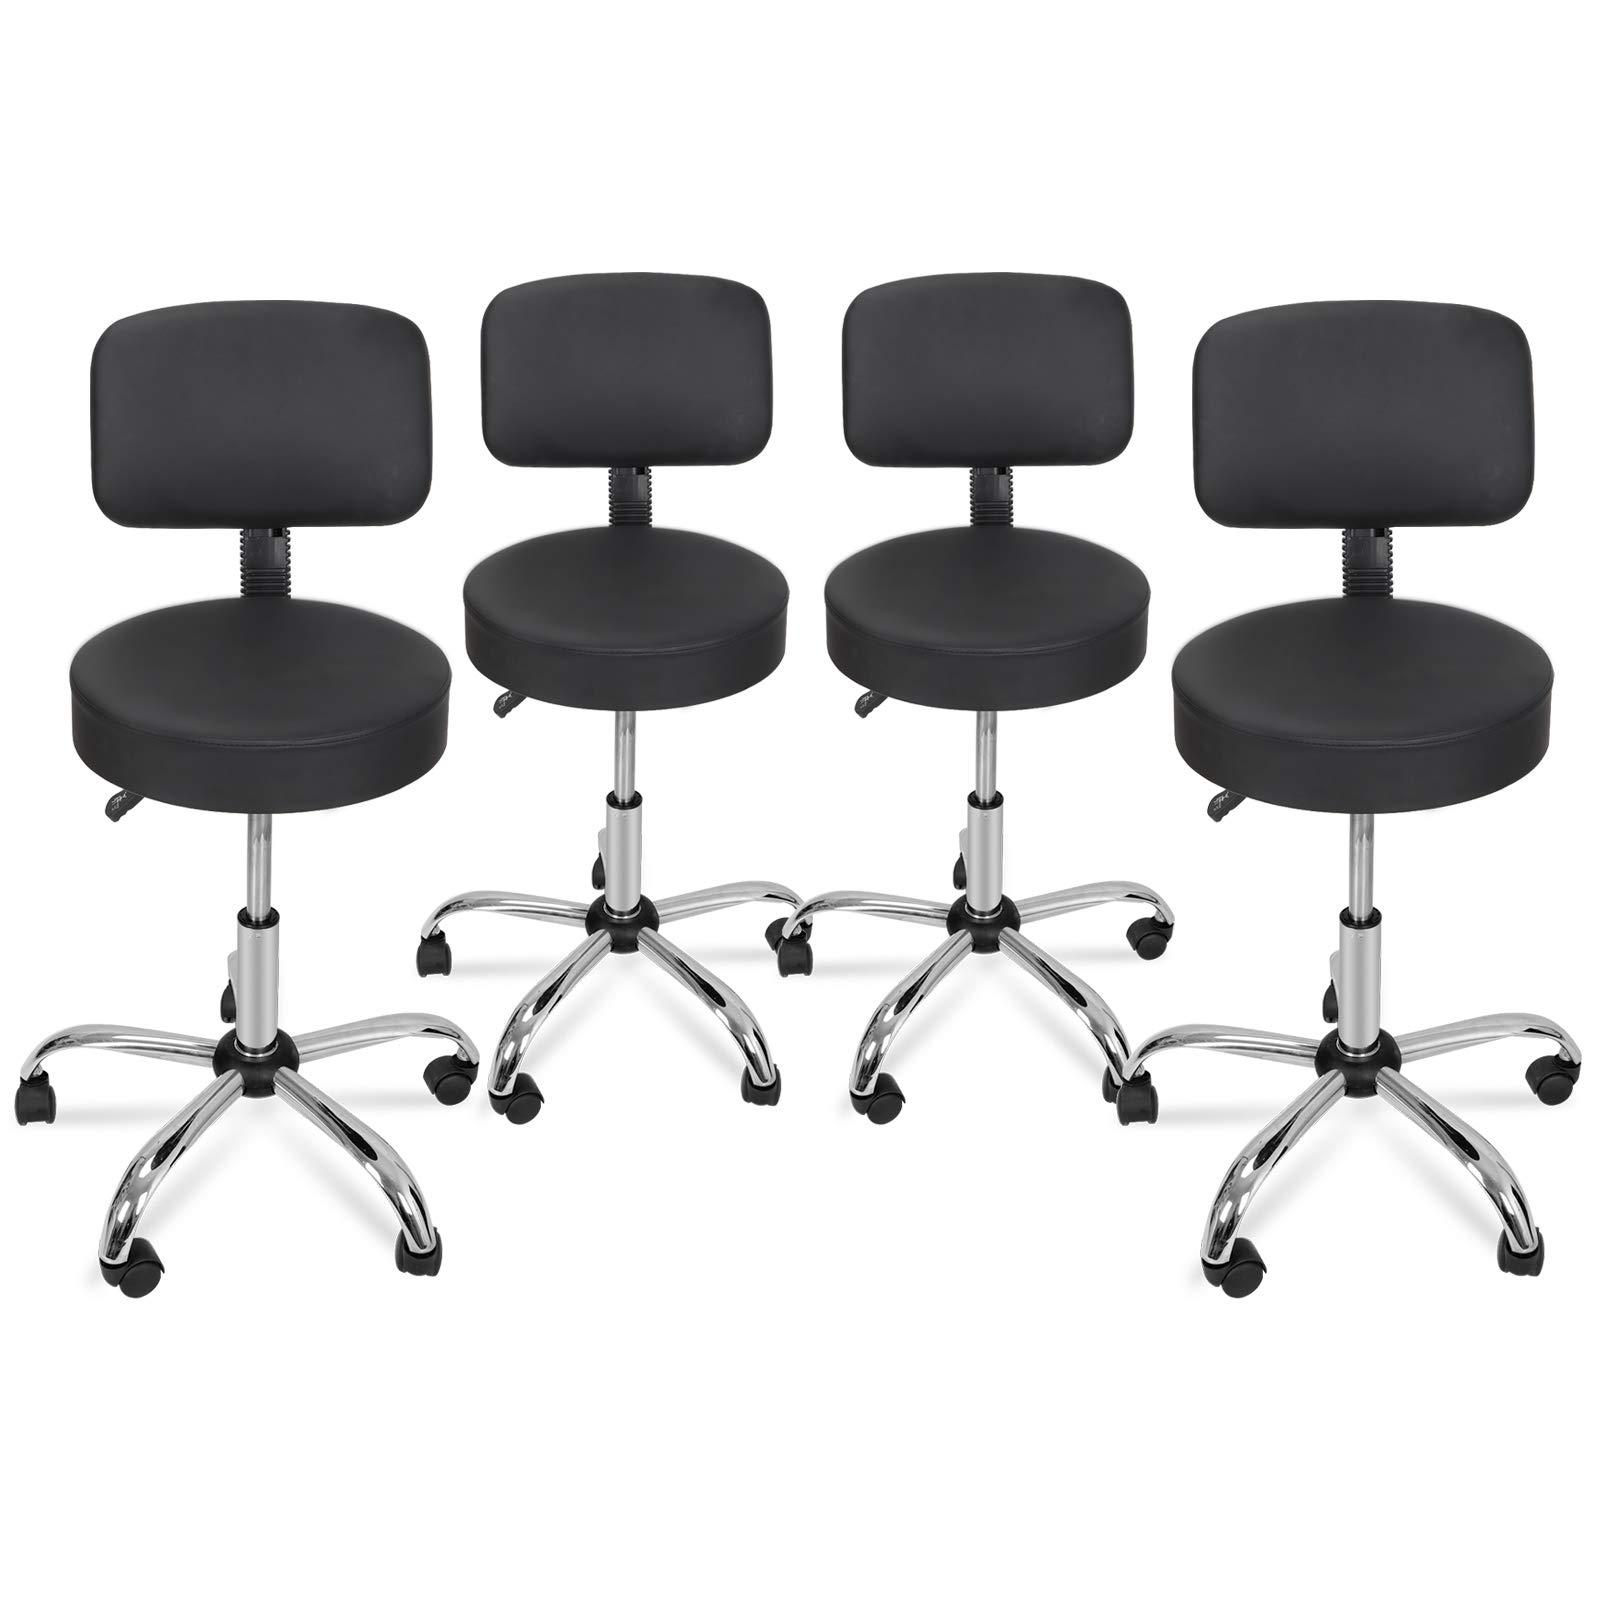 Nova Microdermabrasion Adjustable Hydraulic Rolling Swivel Salon Stool Chair Tattoo Massage Facial Spa Stool Chair with Back (PU Leather Cushion) Black 4pcs